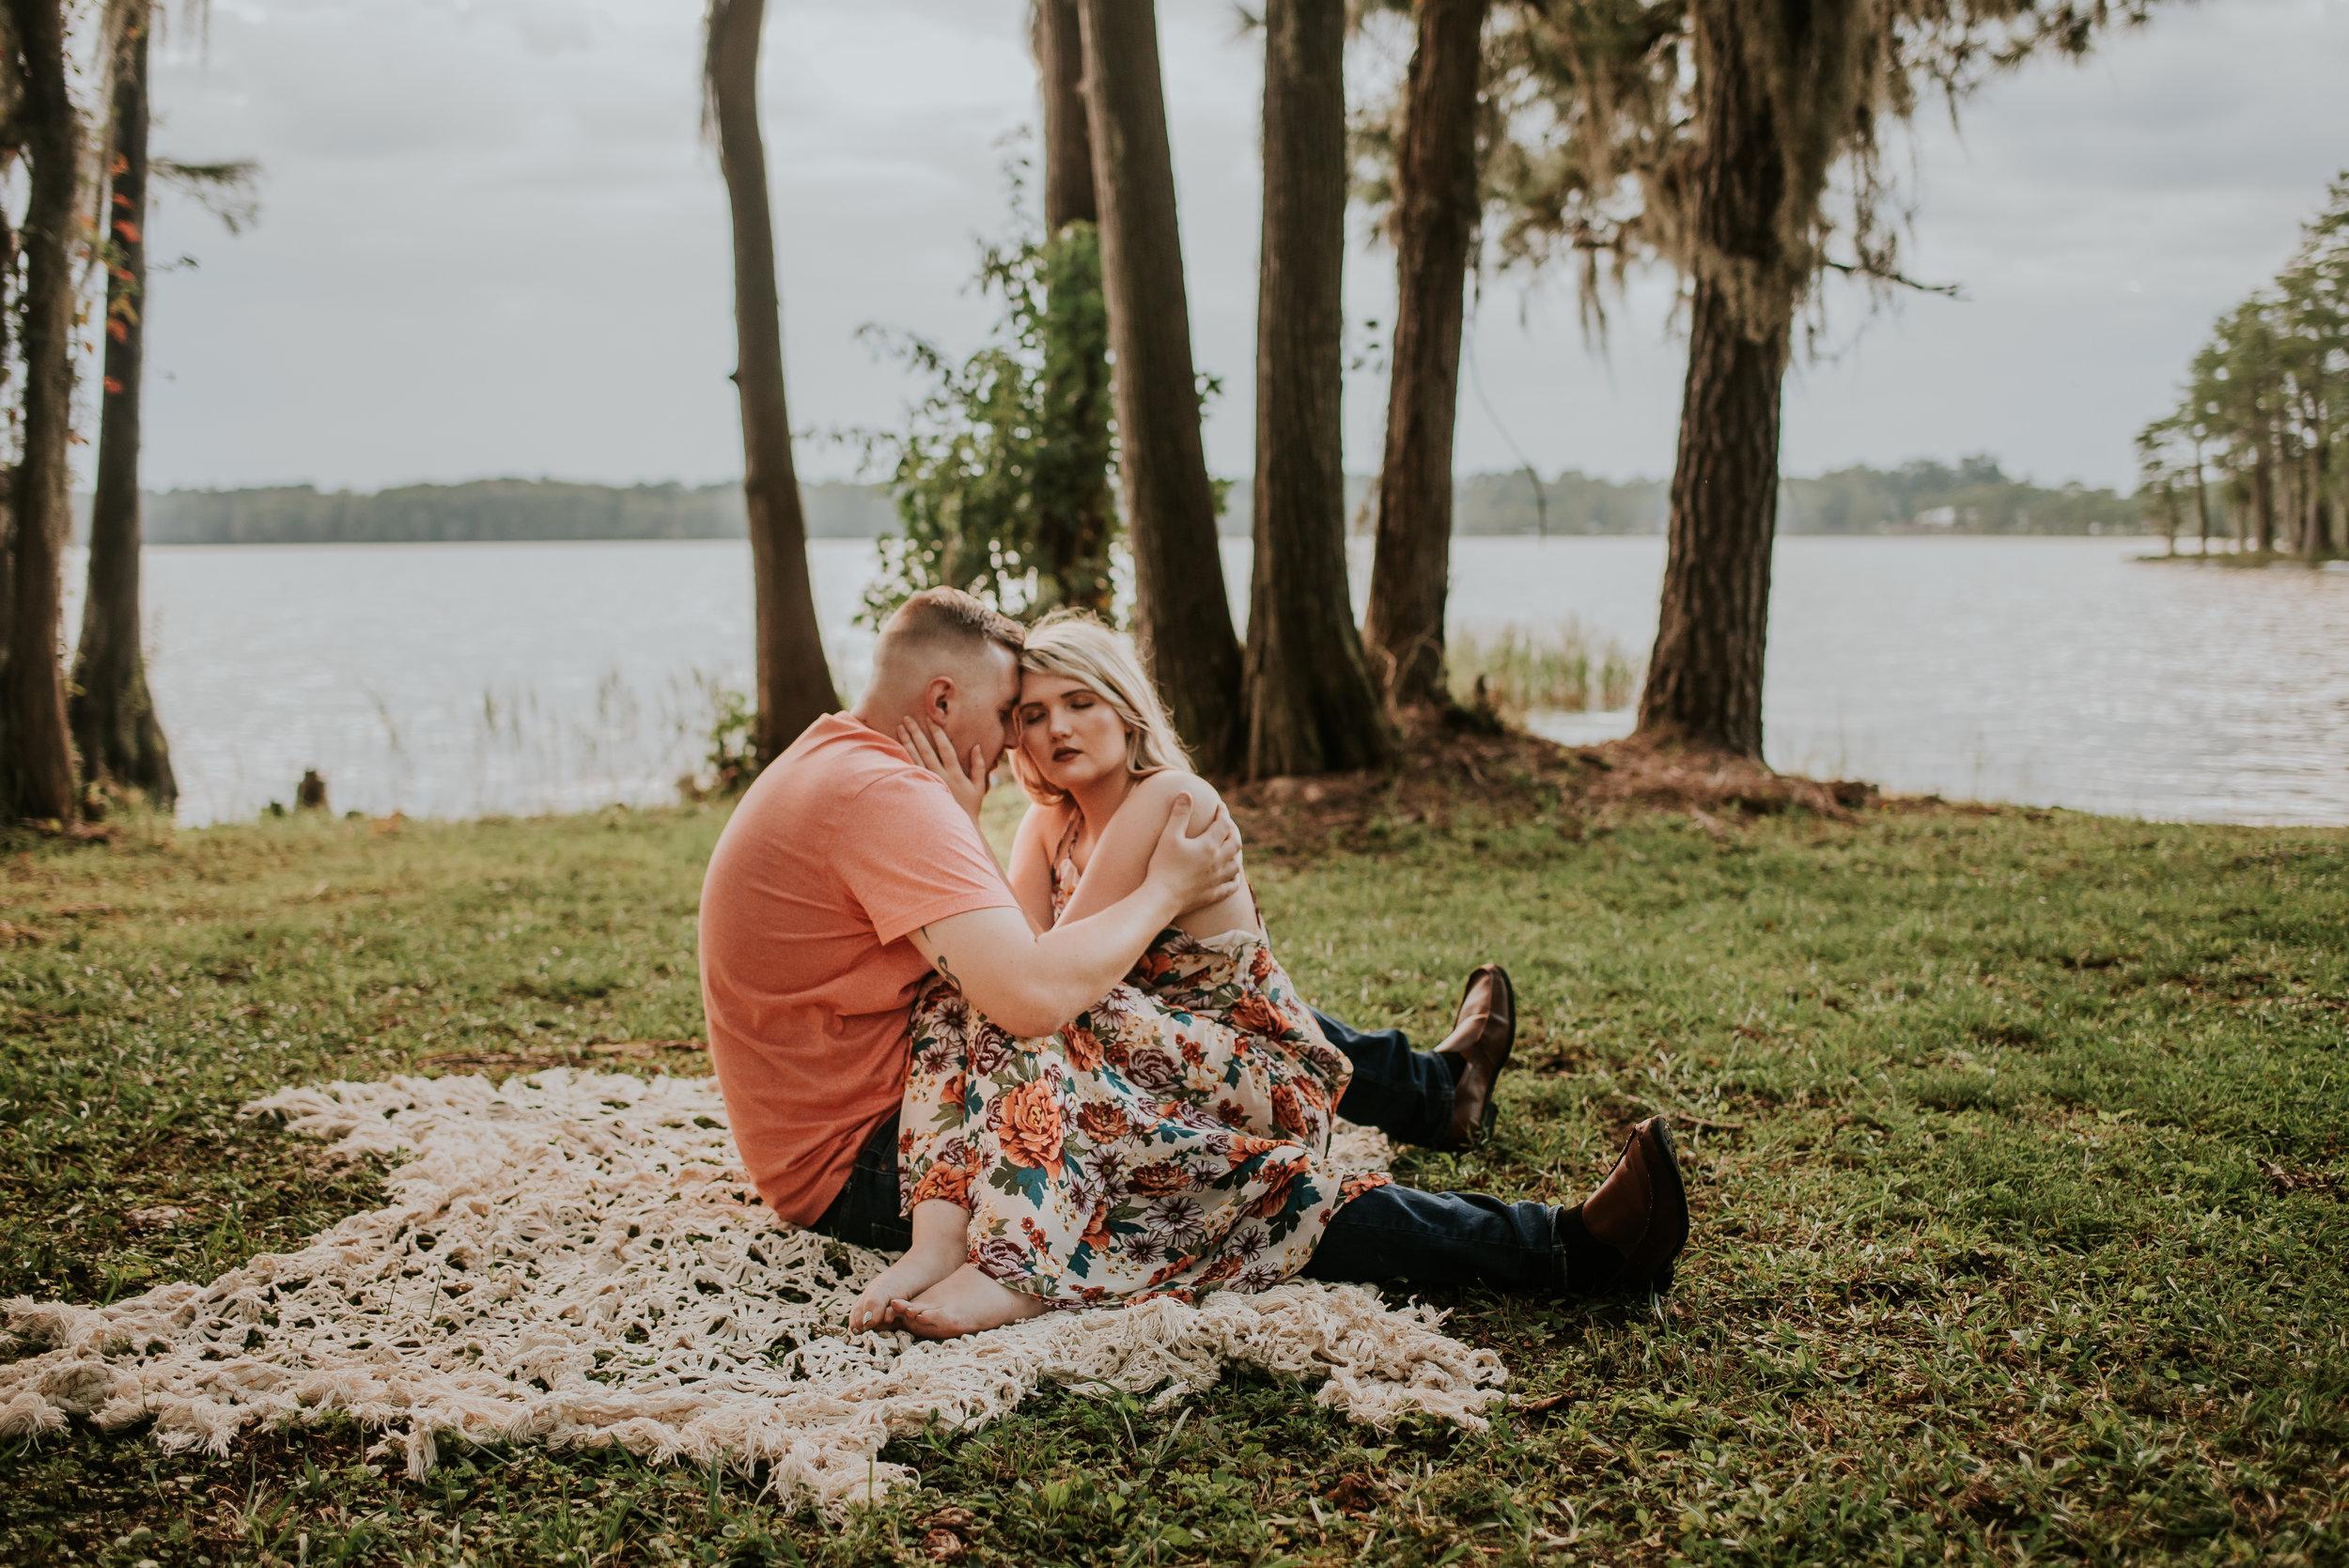 kimberly-trey-crestview-florida-couples-photographer-23.jpg